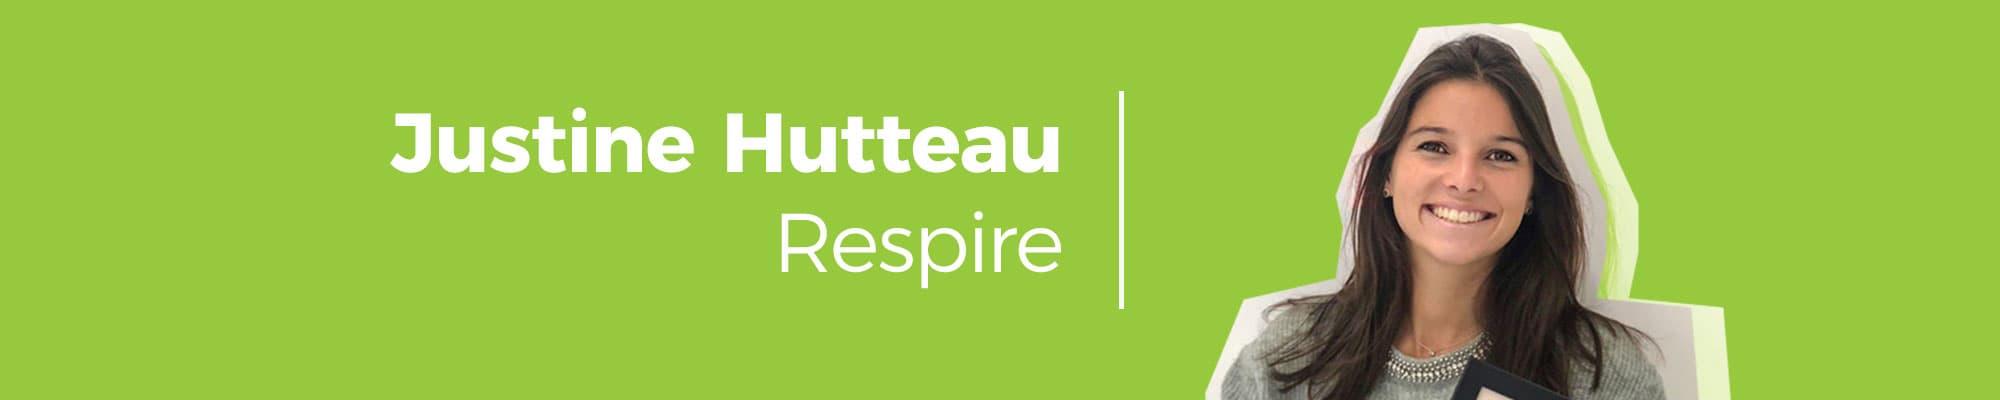 Justine Hutteau entrepreneur inspirante Respire